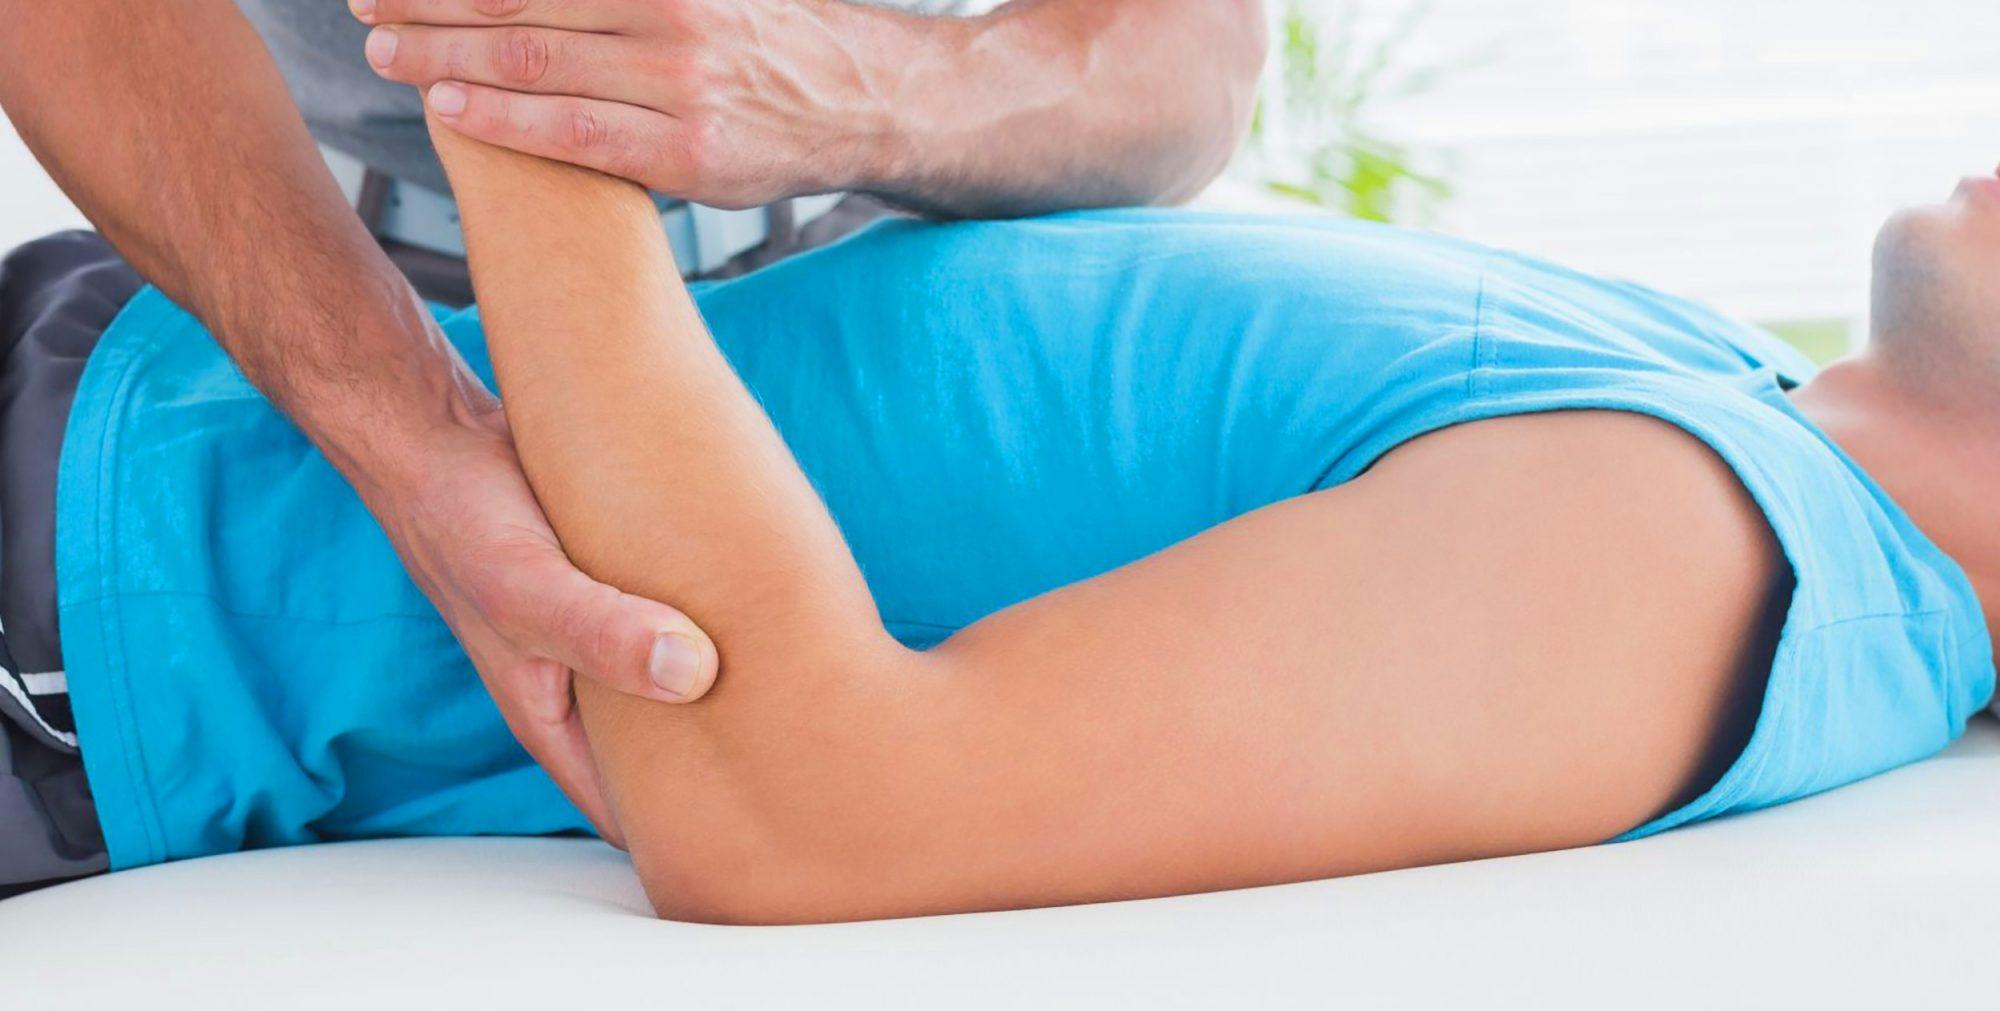 Physiotherapy in Sligo - Avena Leisure | Ray Finan